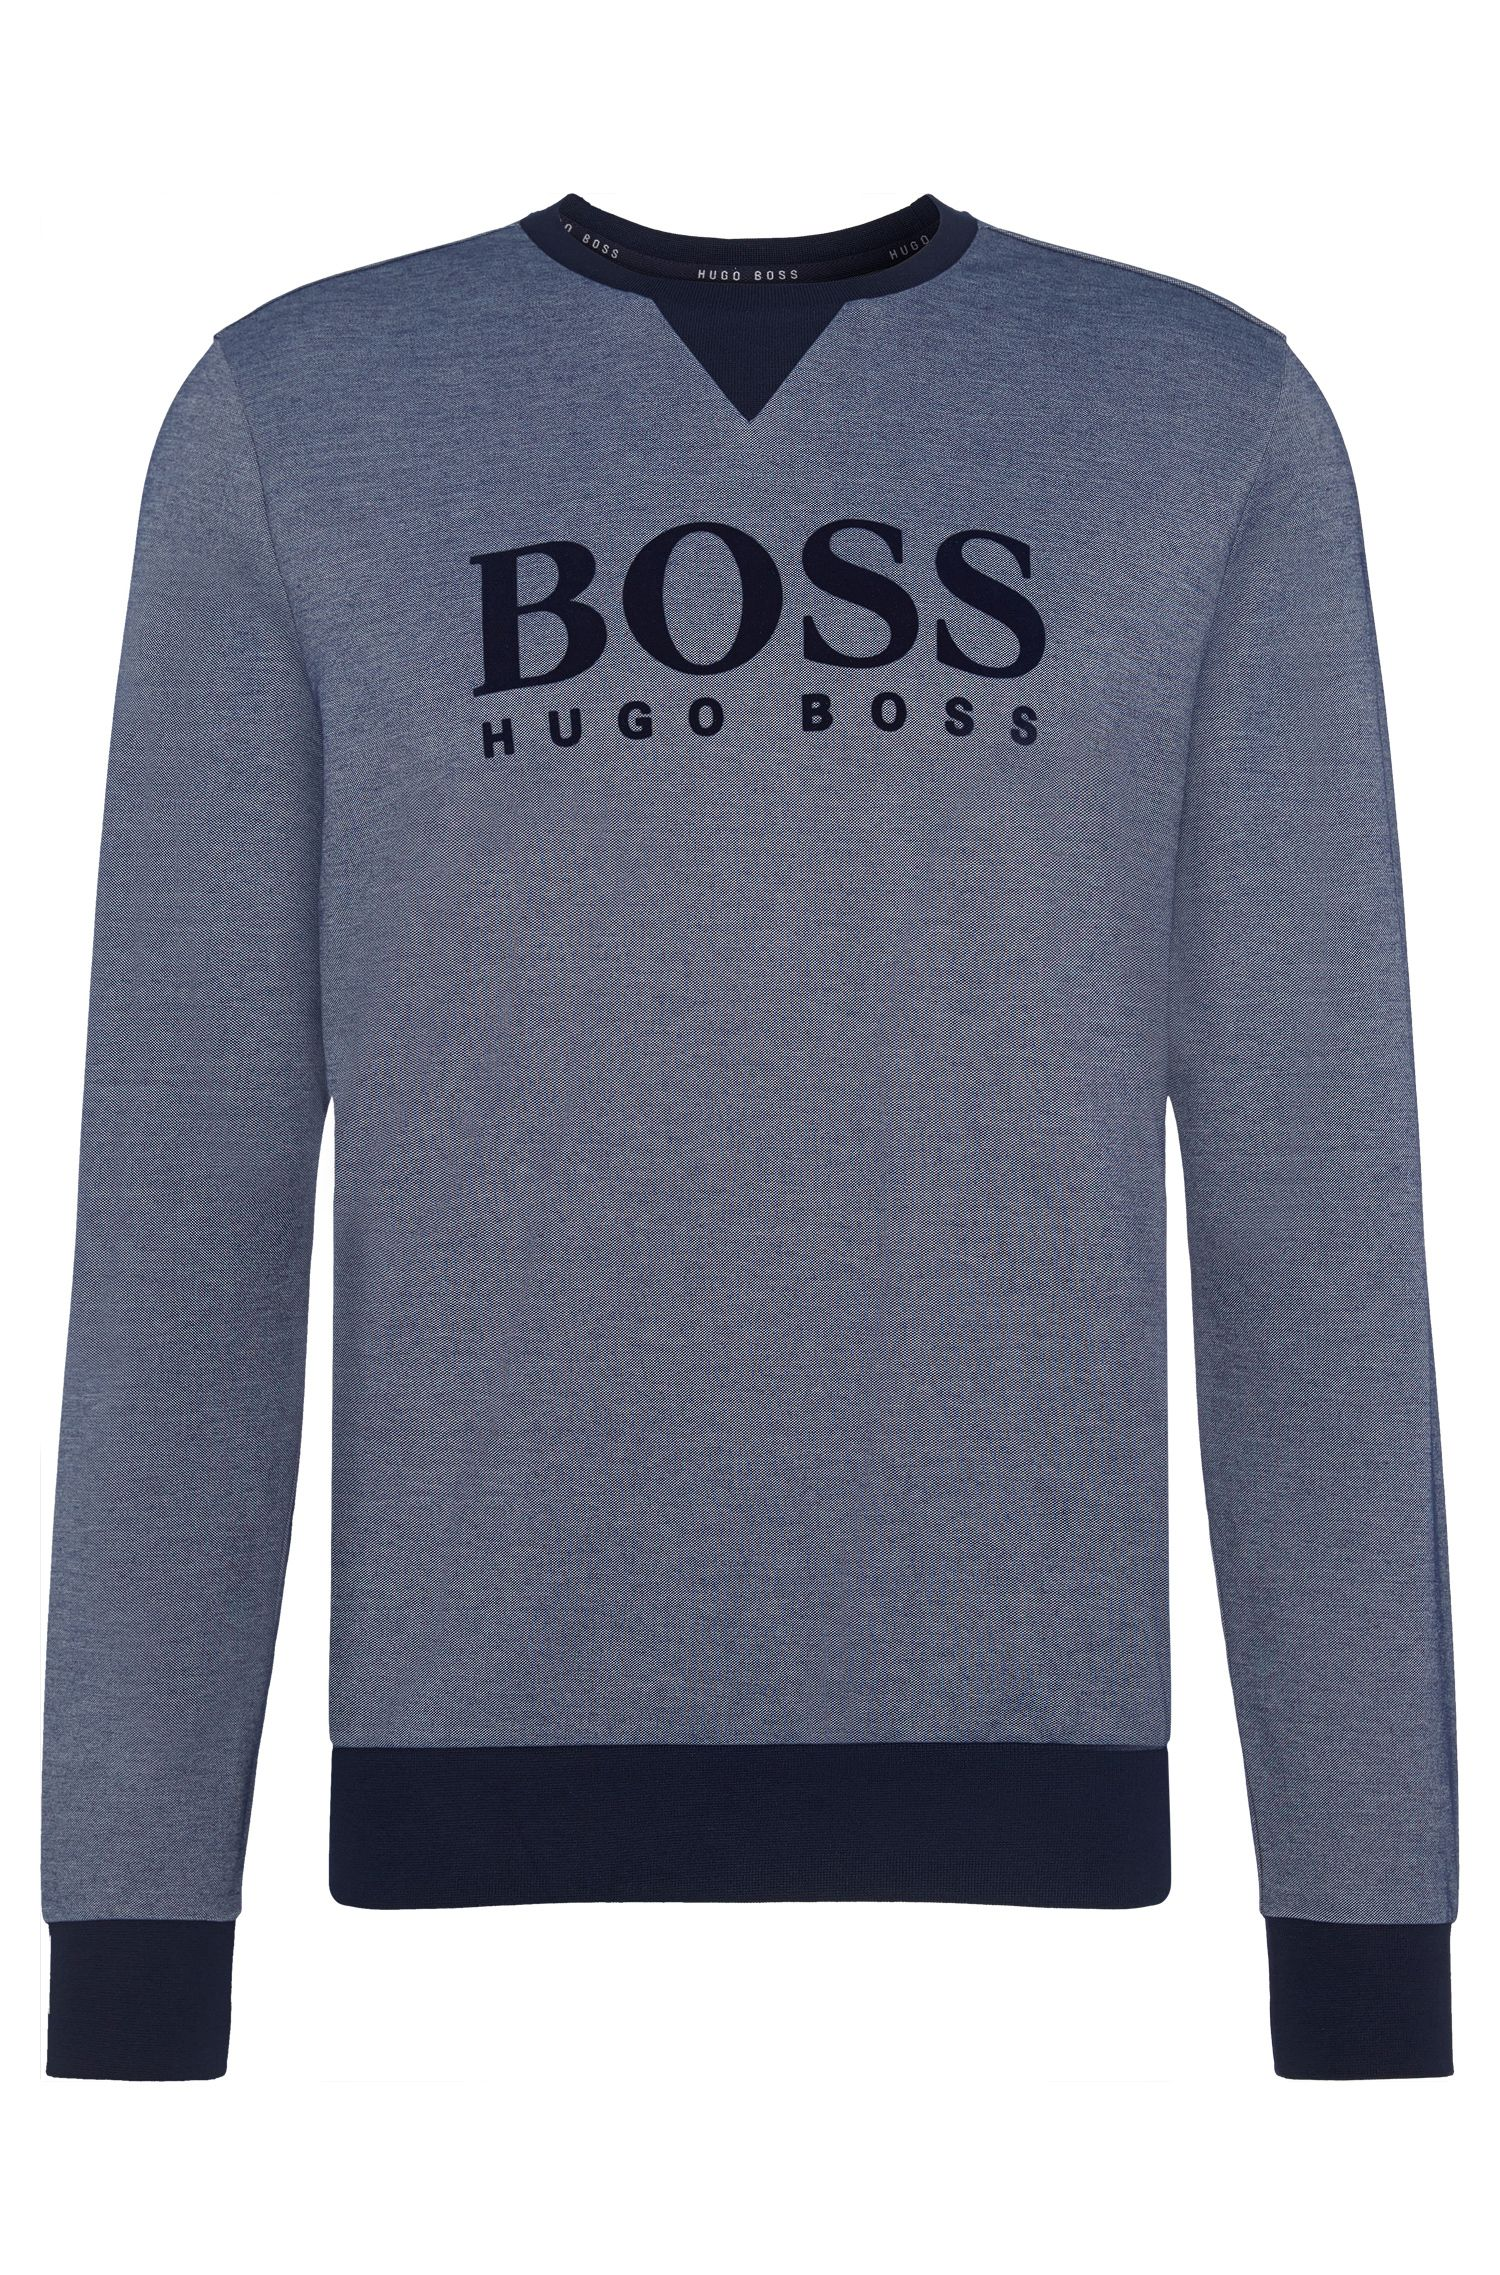 'Sweatshirt' | Cotton Blend Flock Logo Sweatshirt